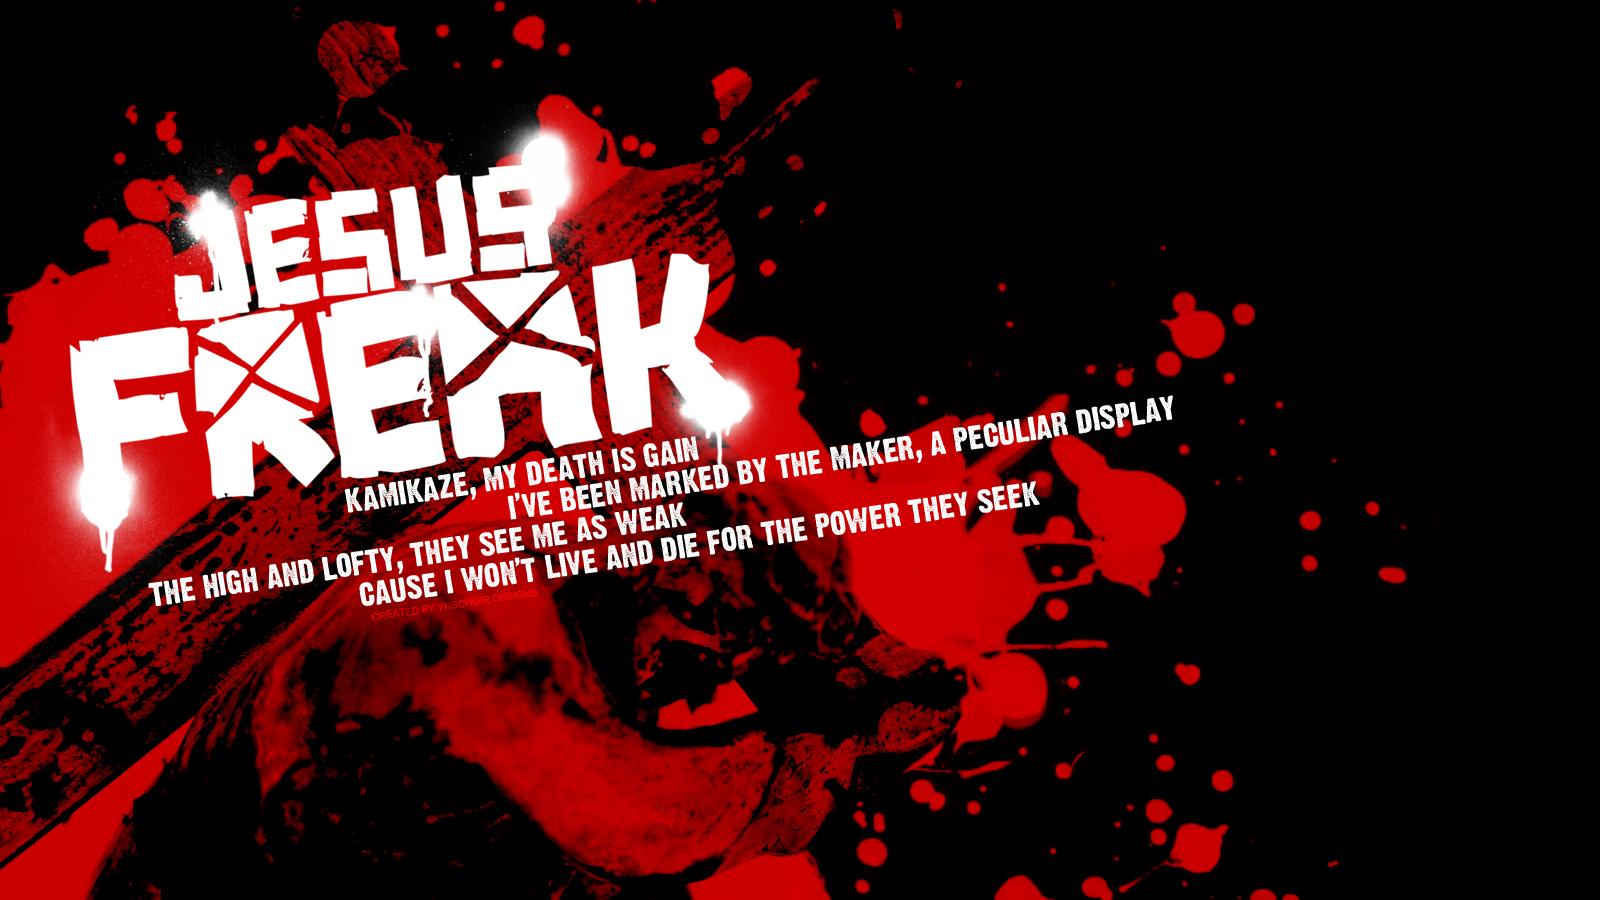 Christian Graphic Jesus Freak Black And Red Wallpaper Christian